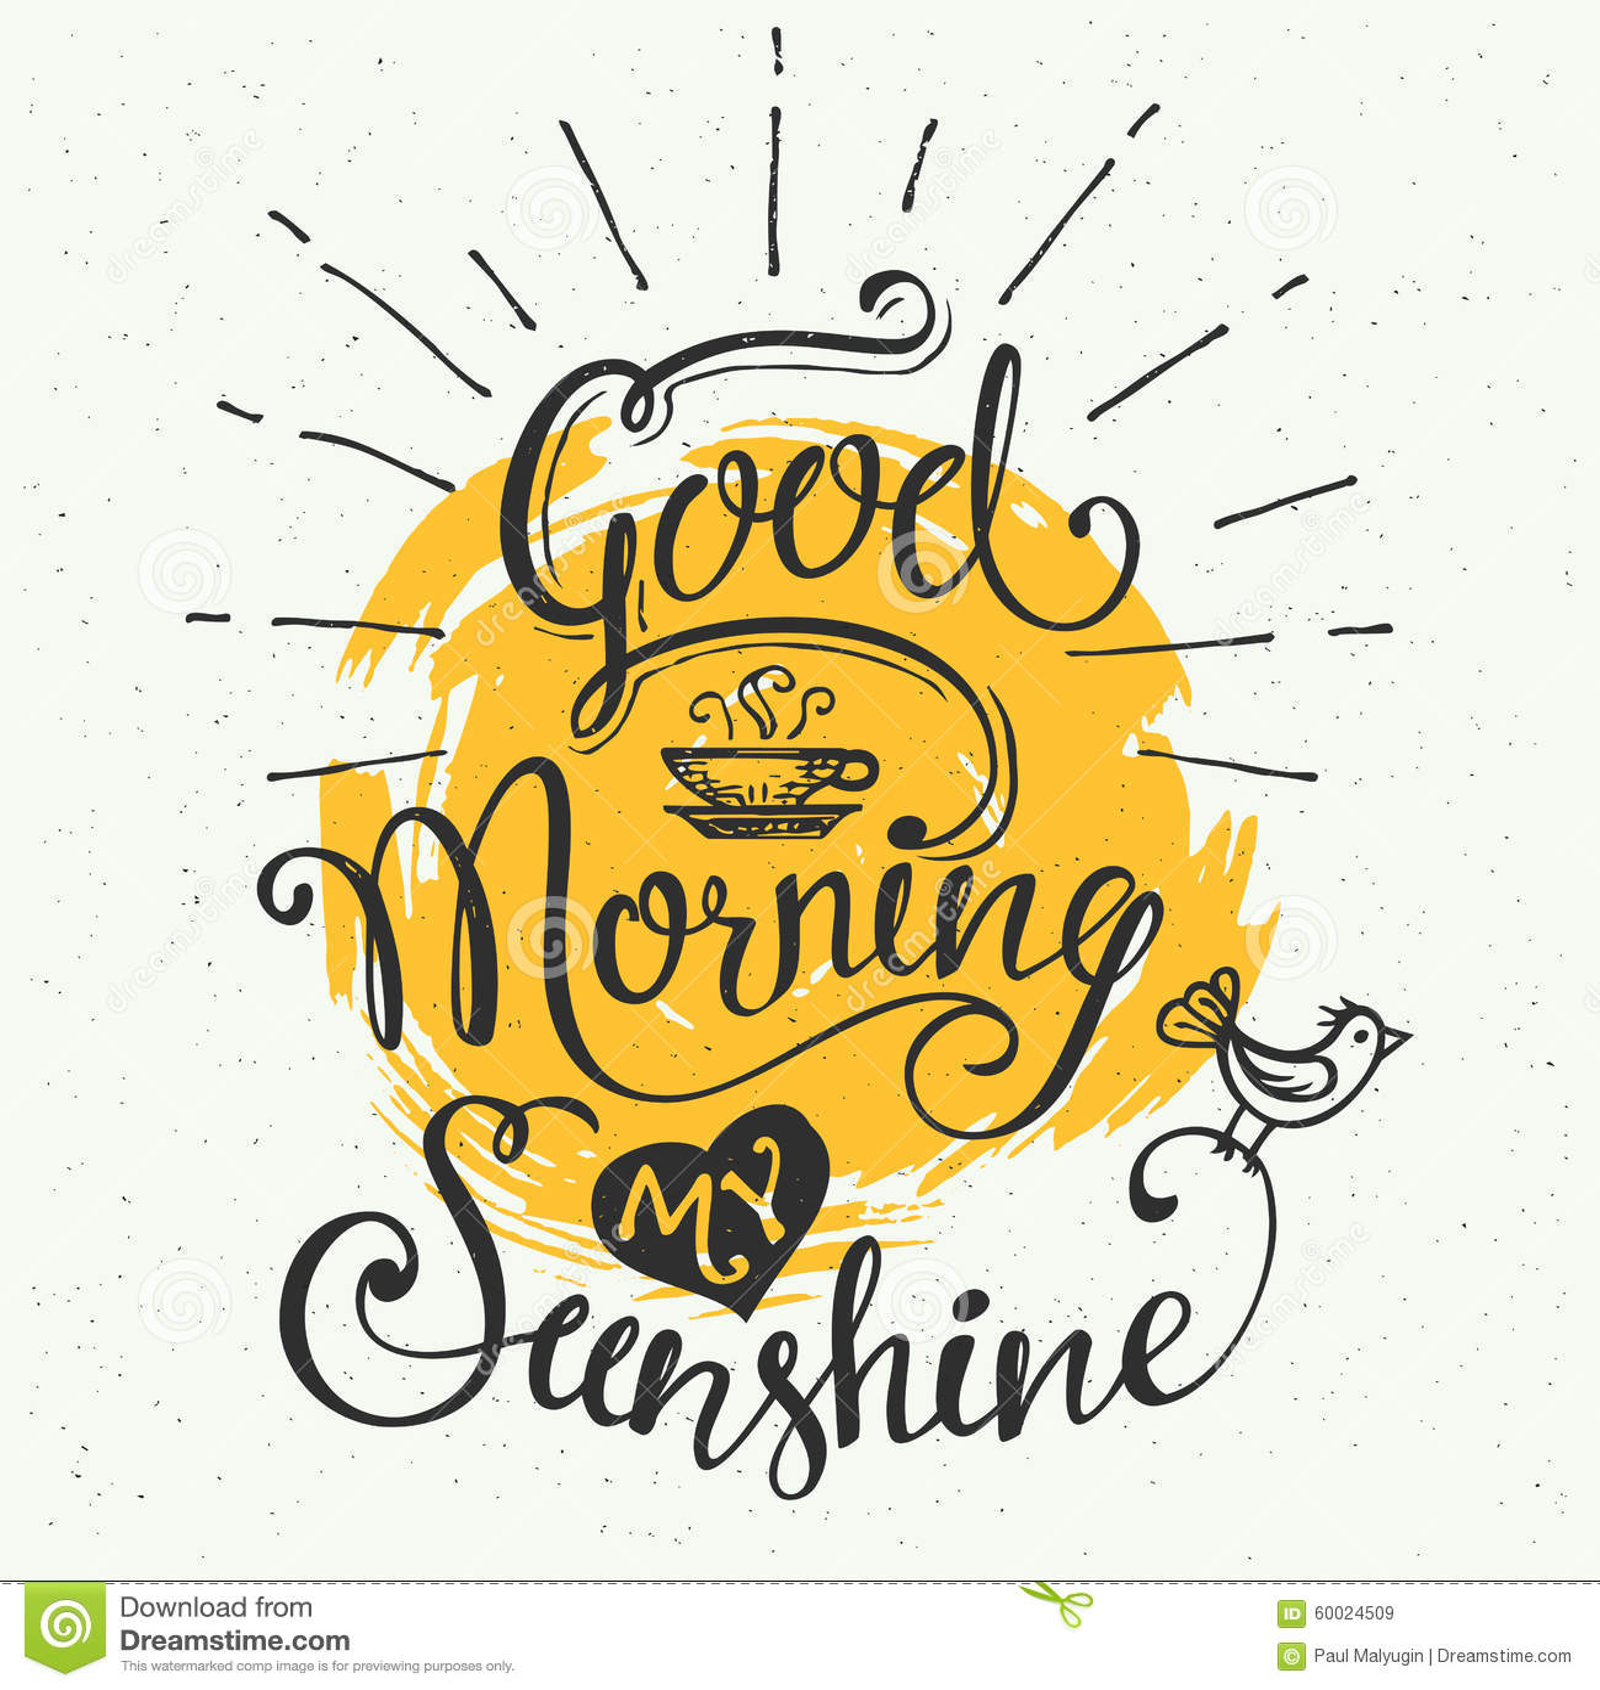 Good Morning Sunshine My Only Sunshine : Good morning my sunshine stock vector image